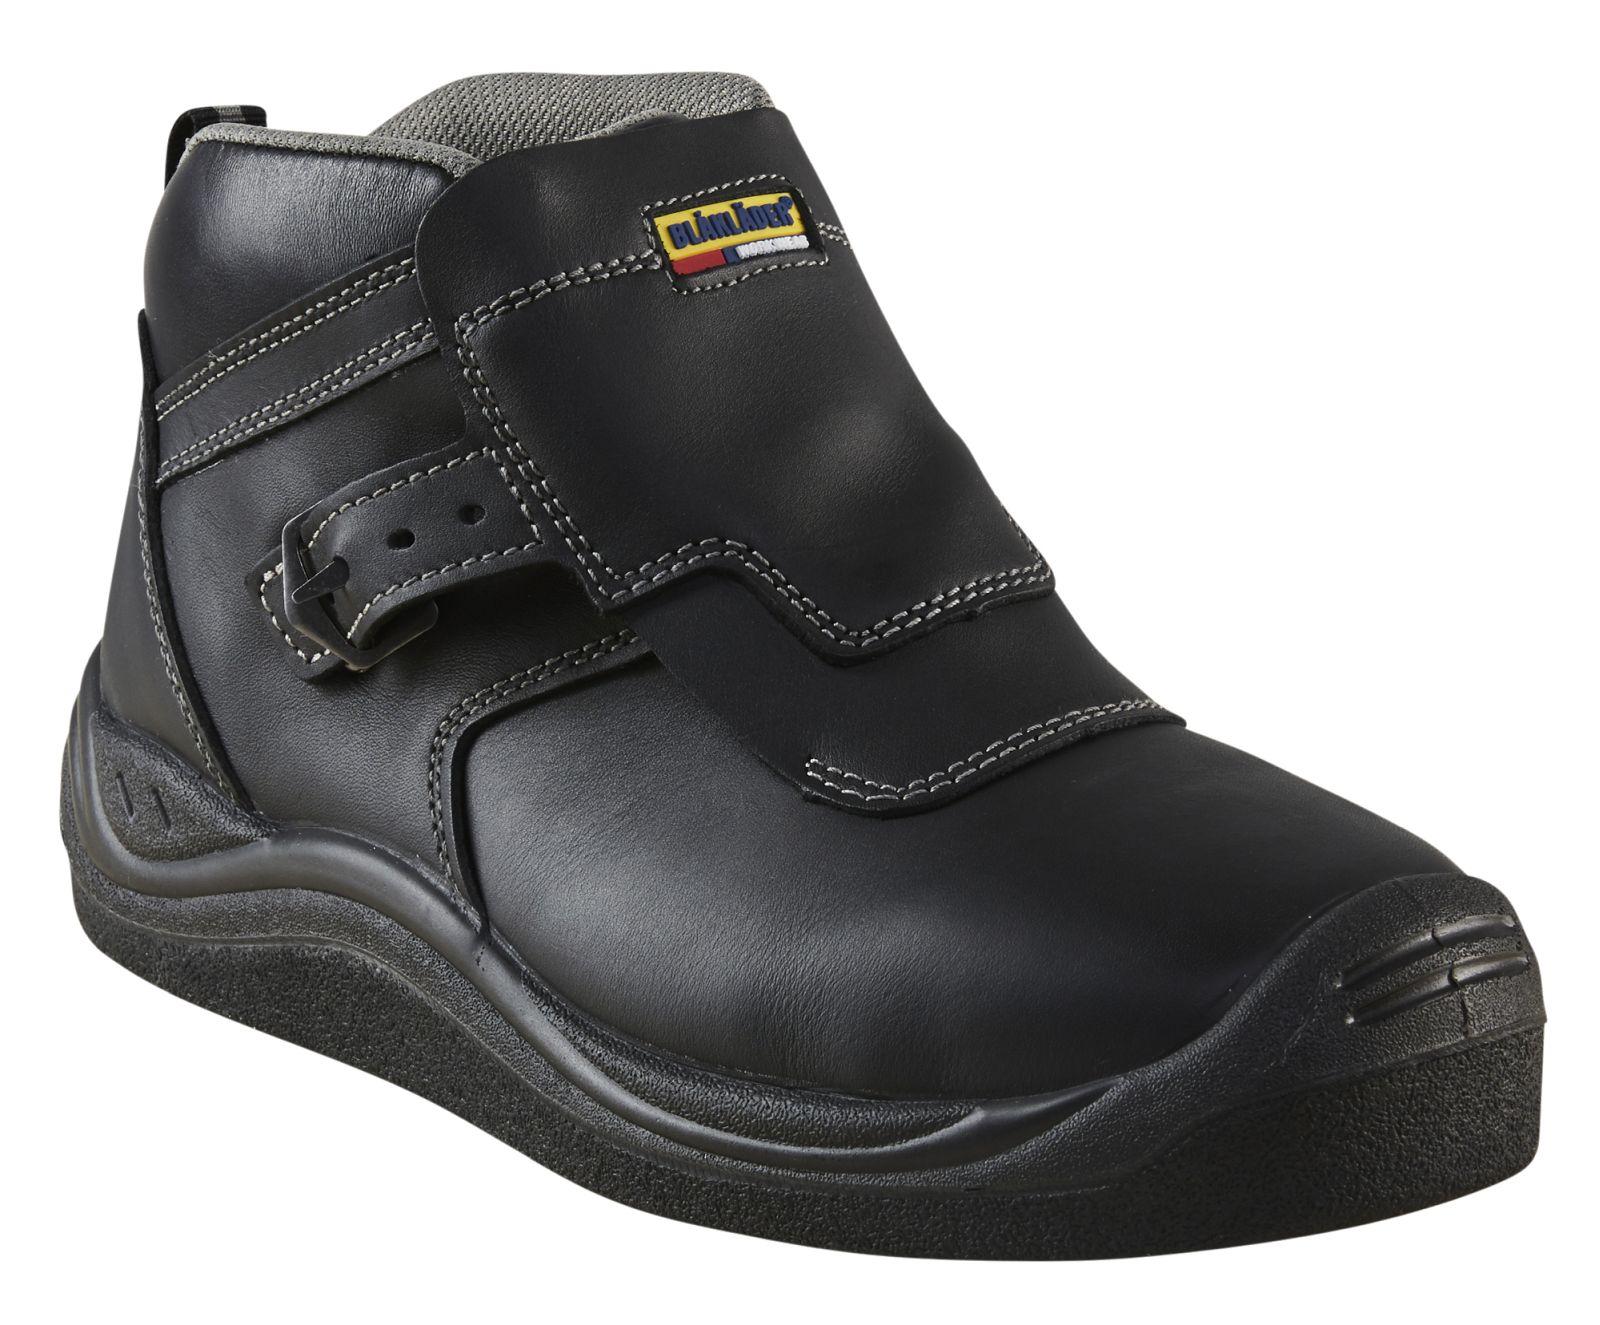 Blaklader Veiligheidsschoenen 24190000 Hittebestendig zwart(9900)